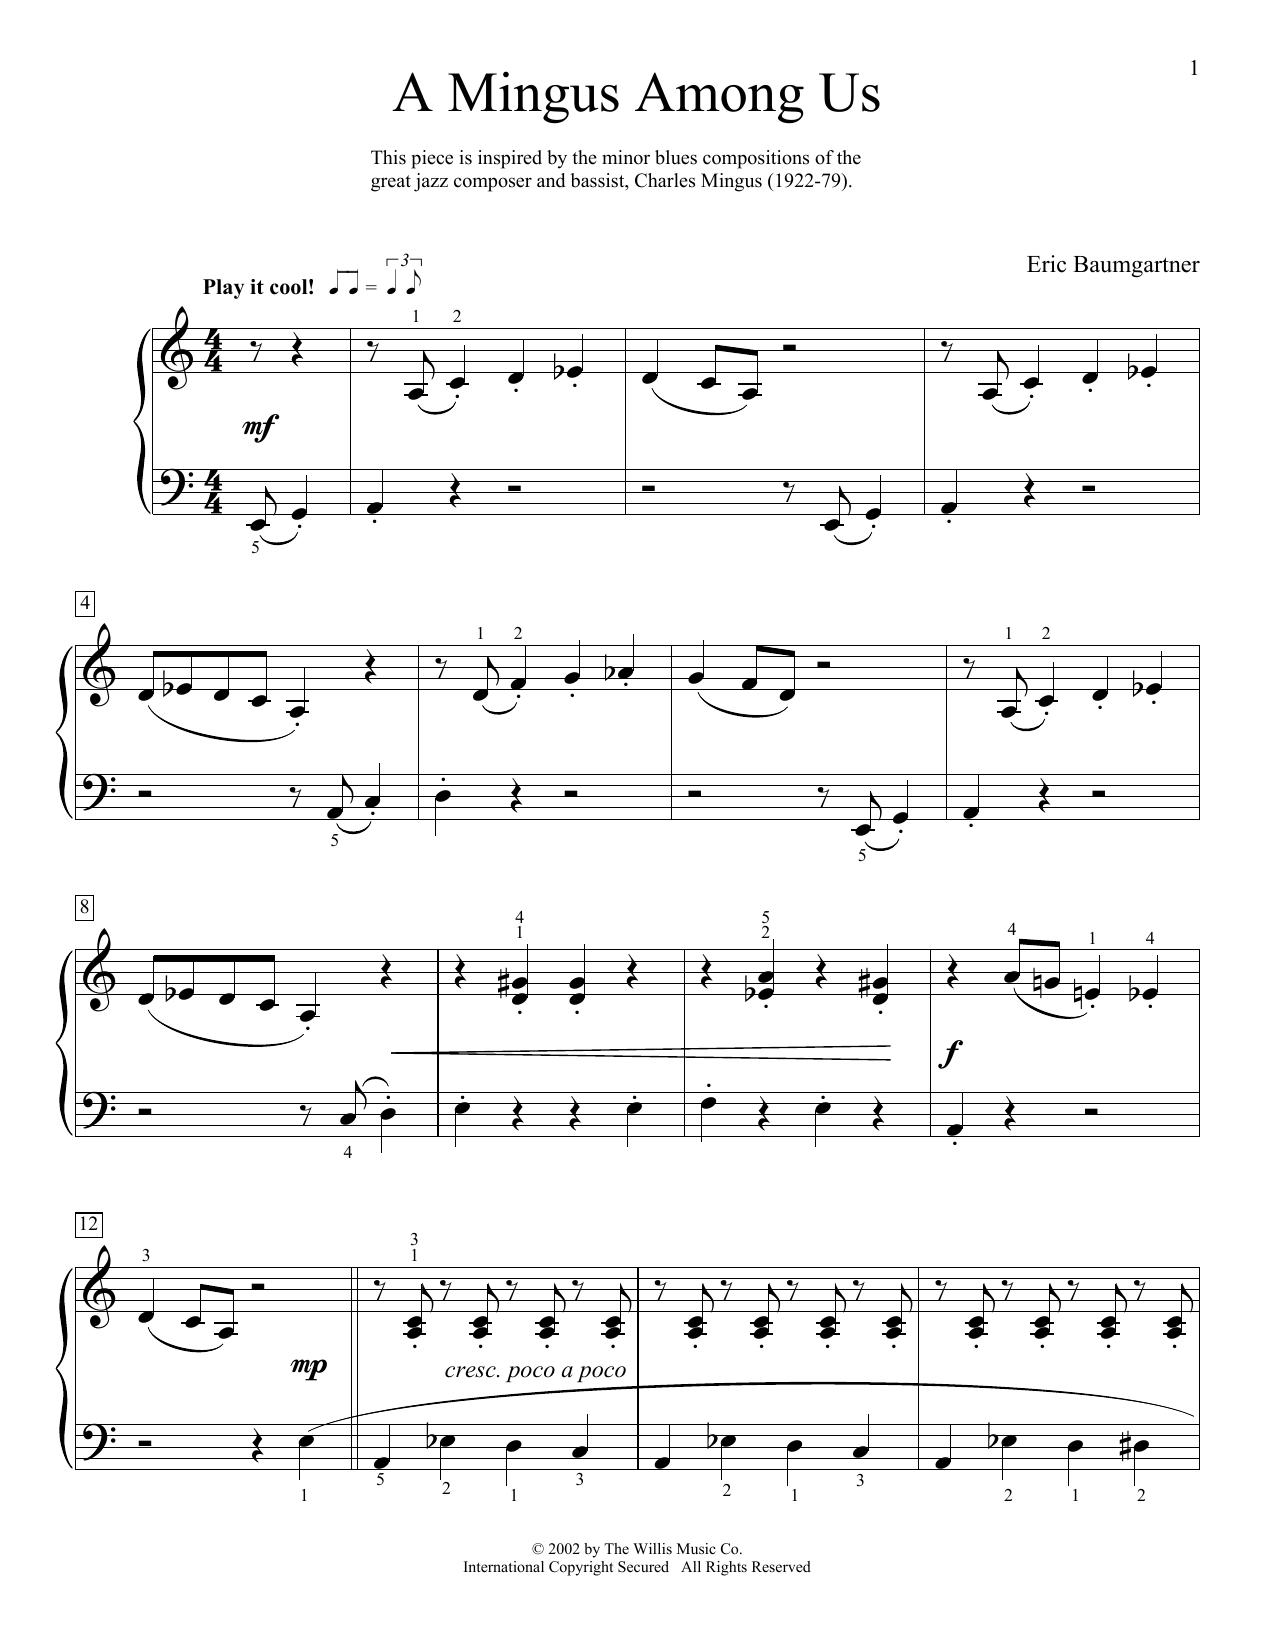 A Mingus Among Us Sheet Music